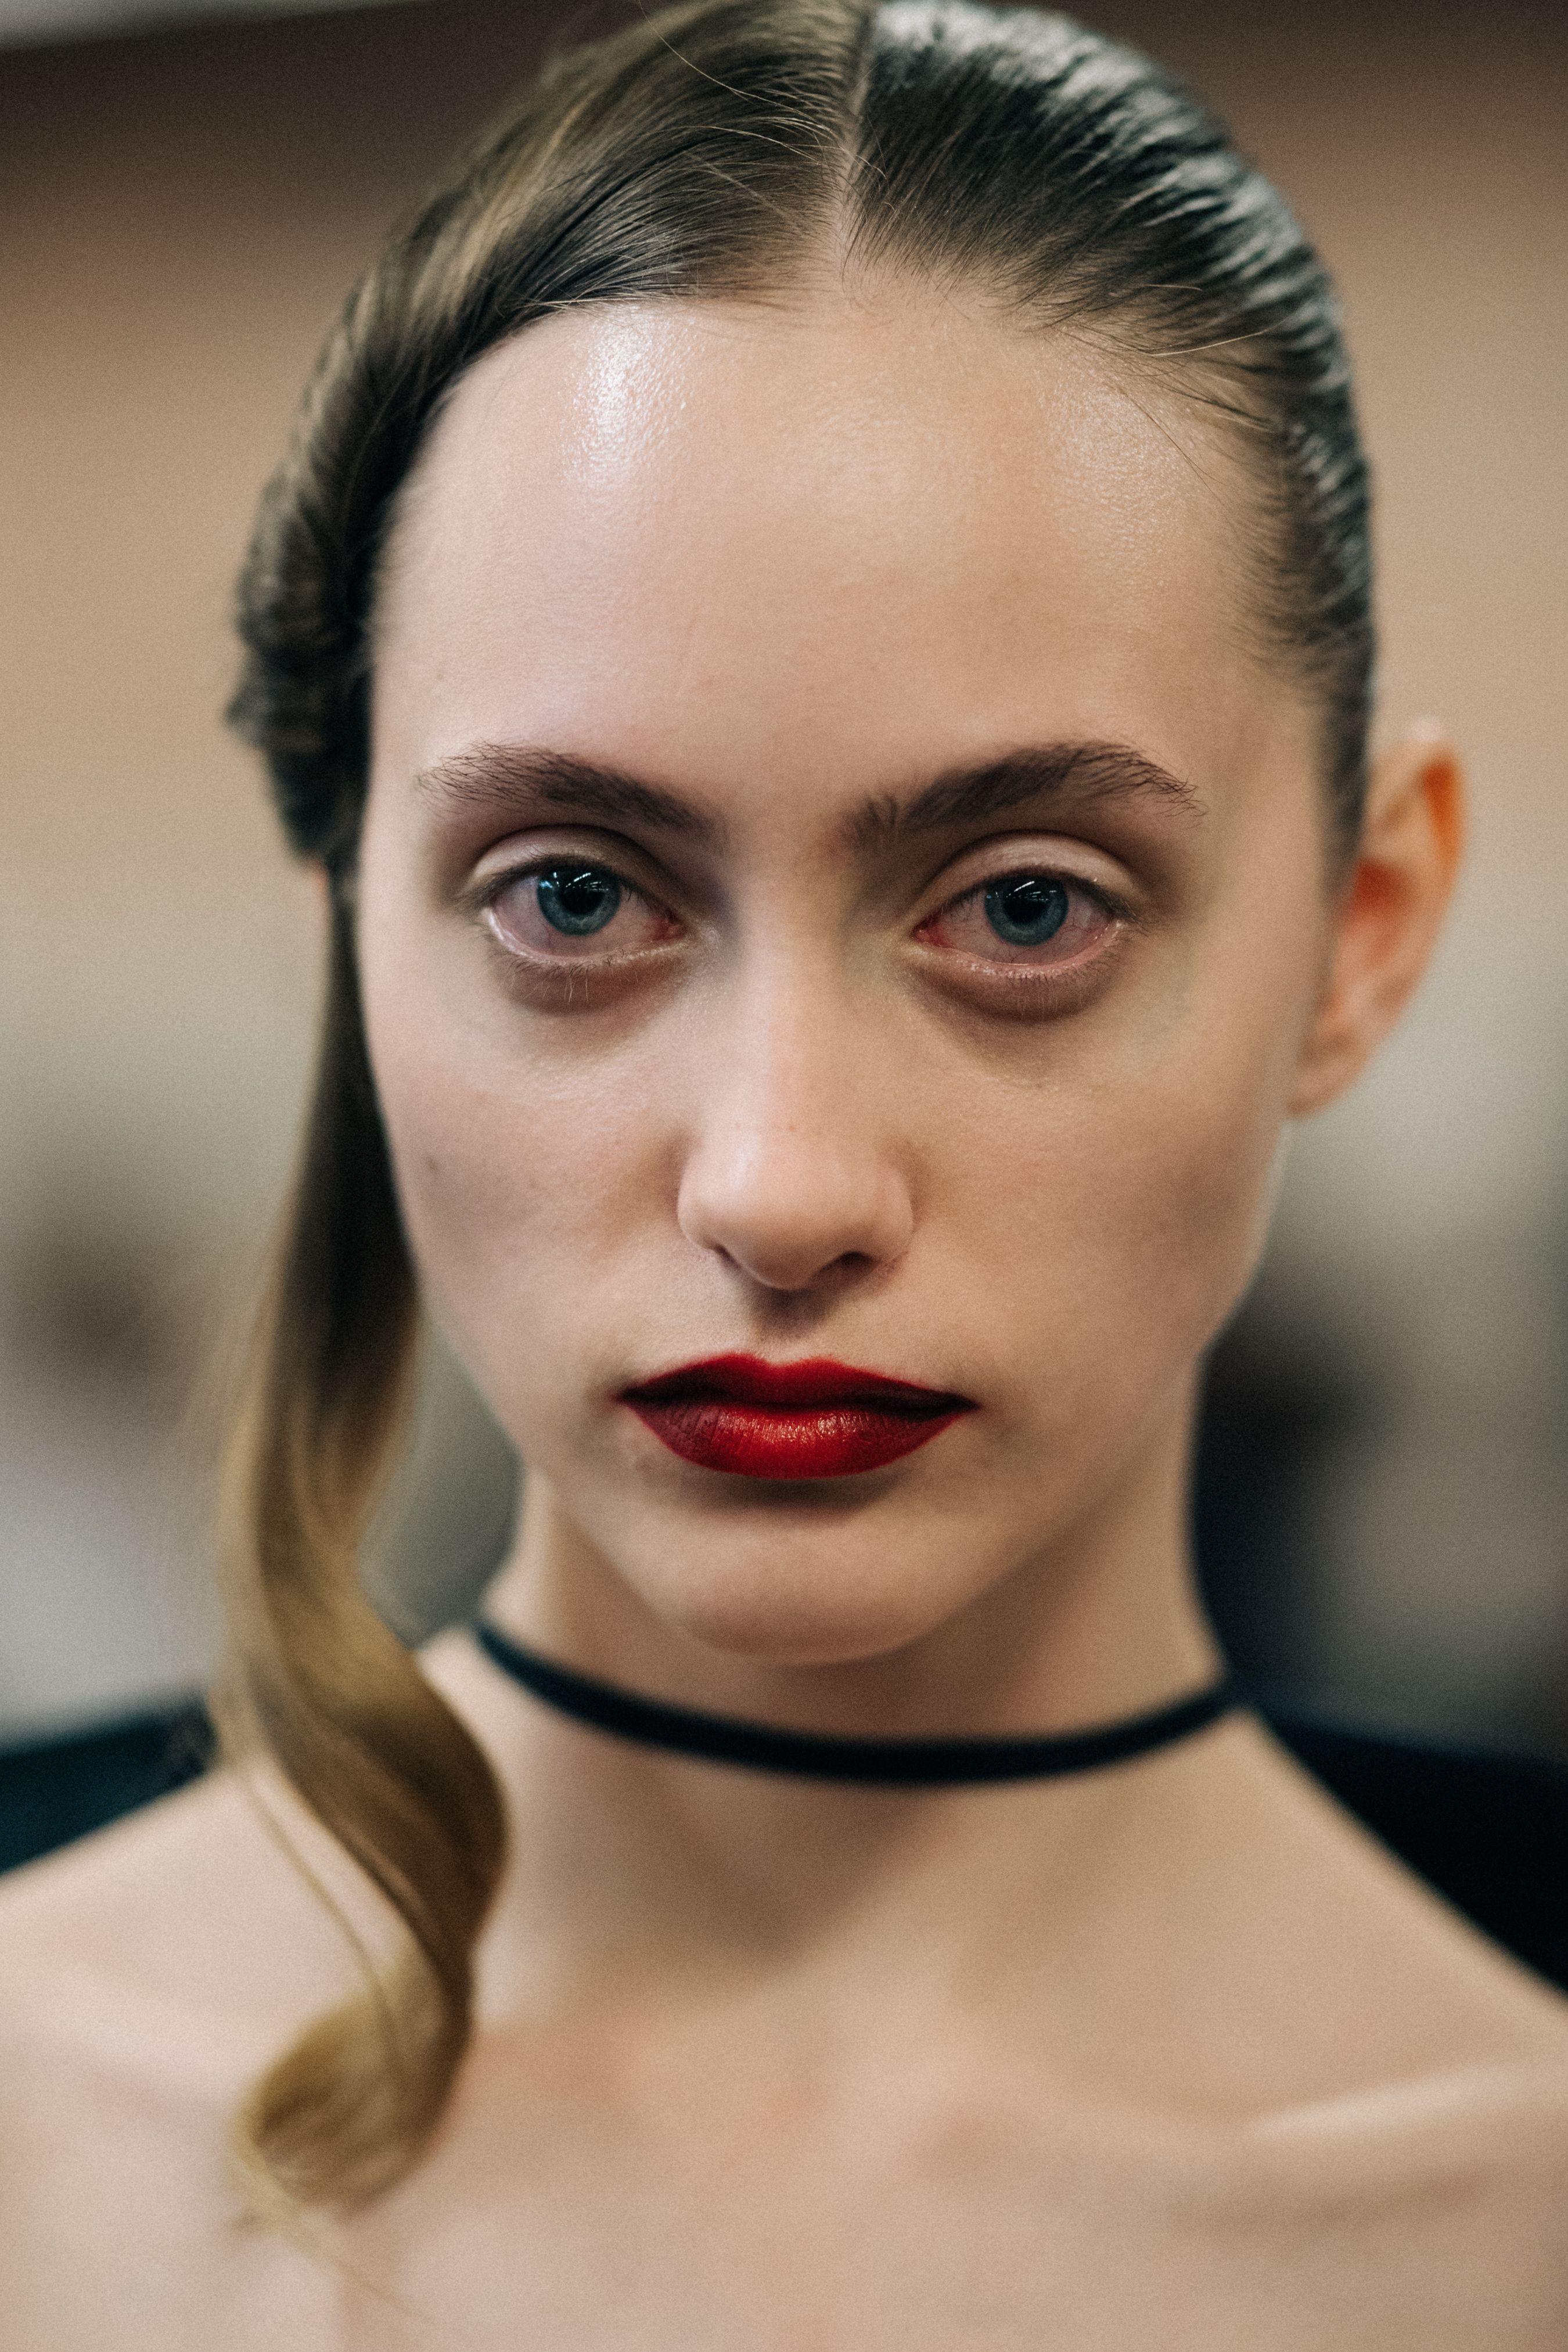 Backstage at Helmut Lang New York City Makeup looks